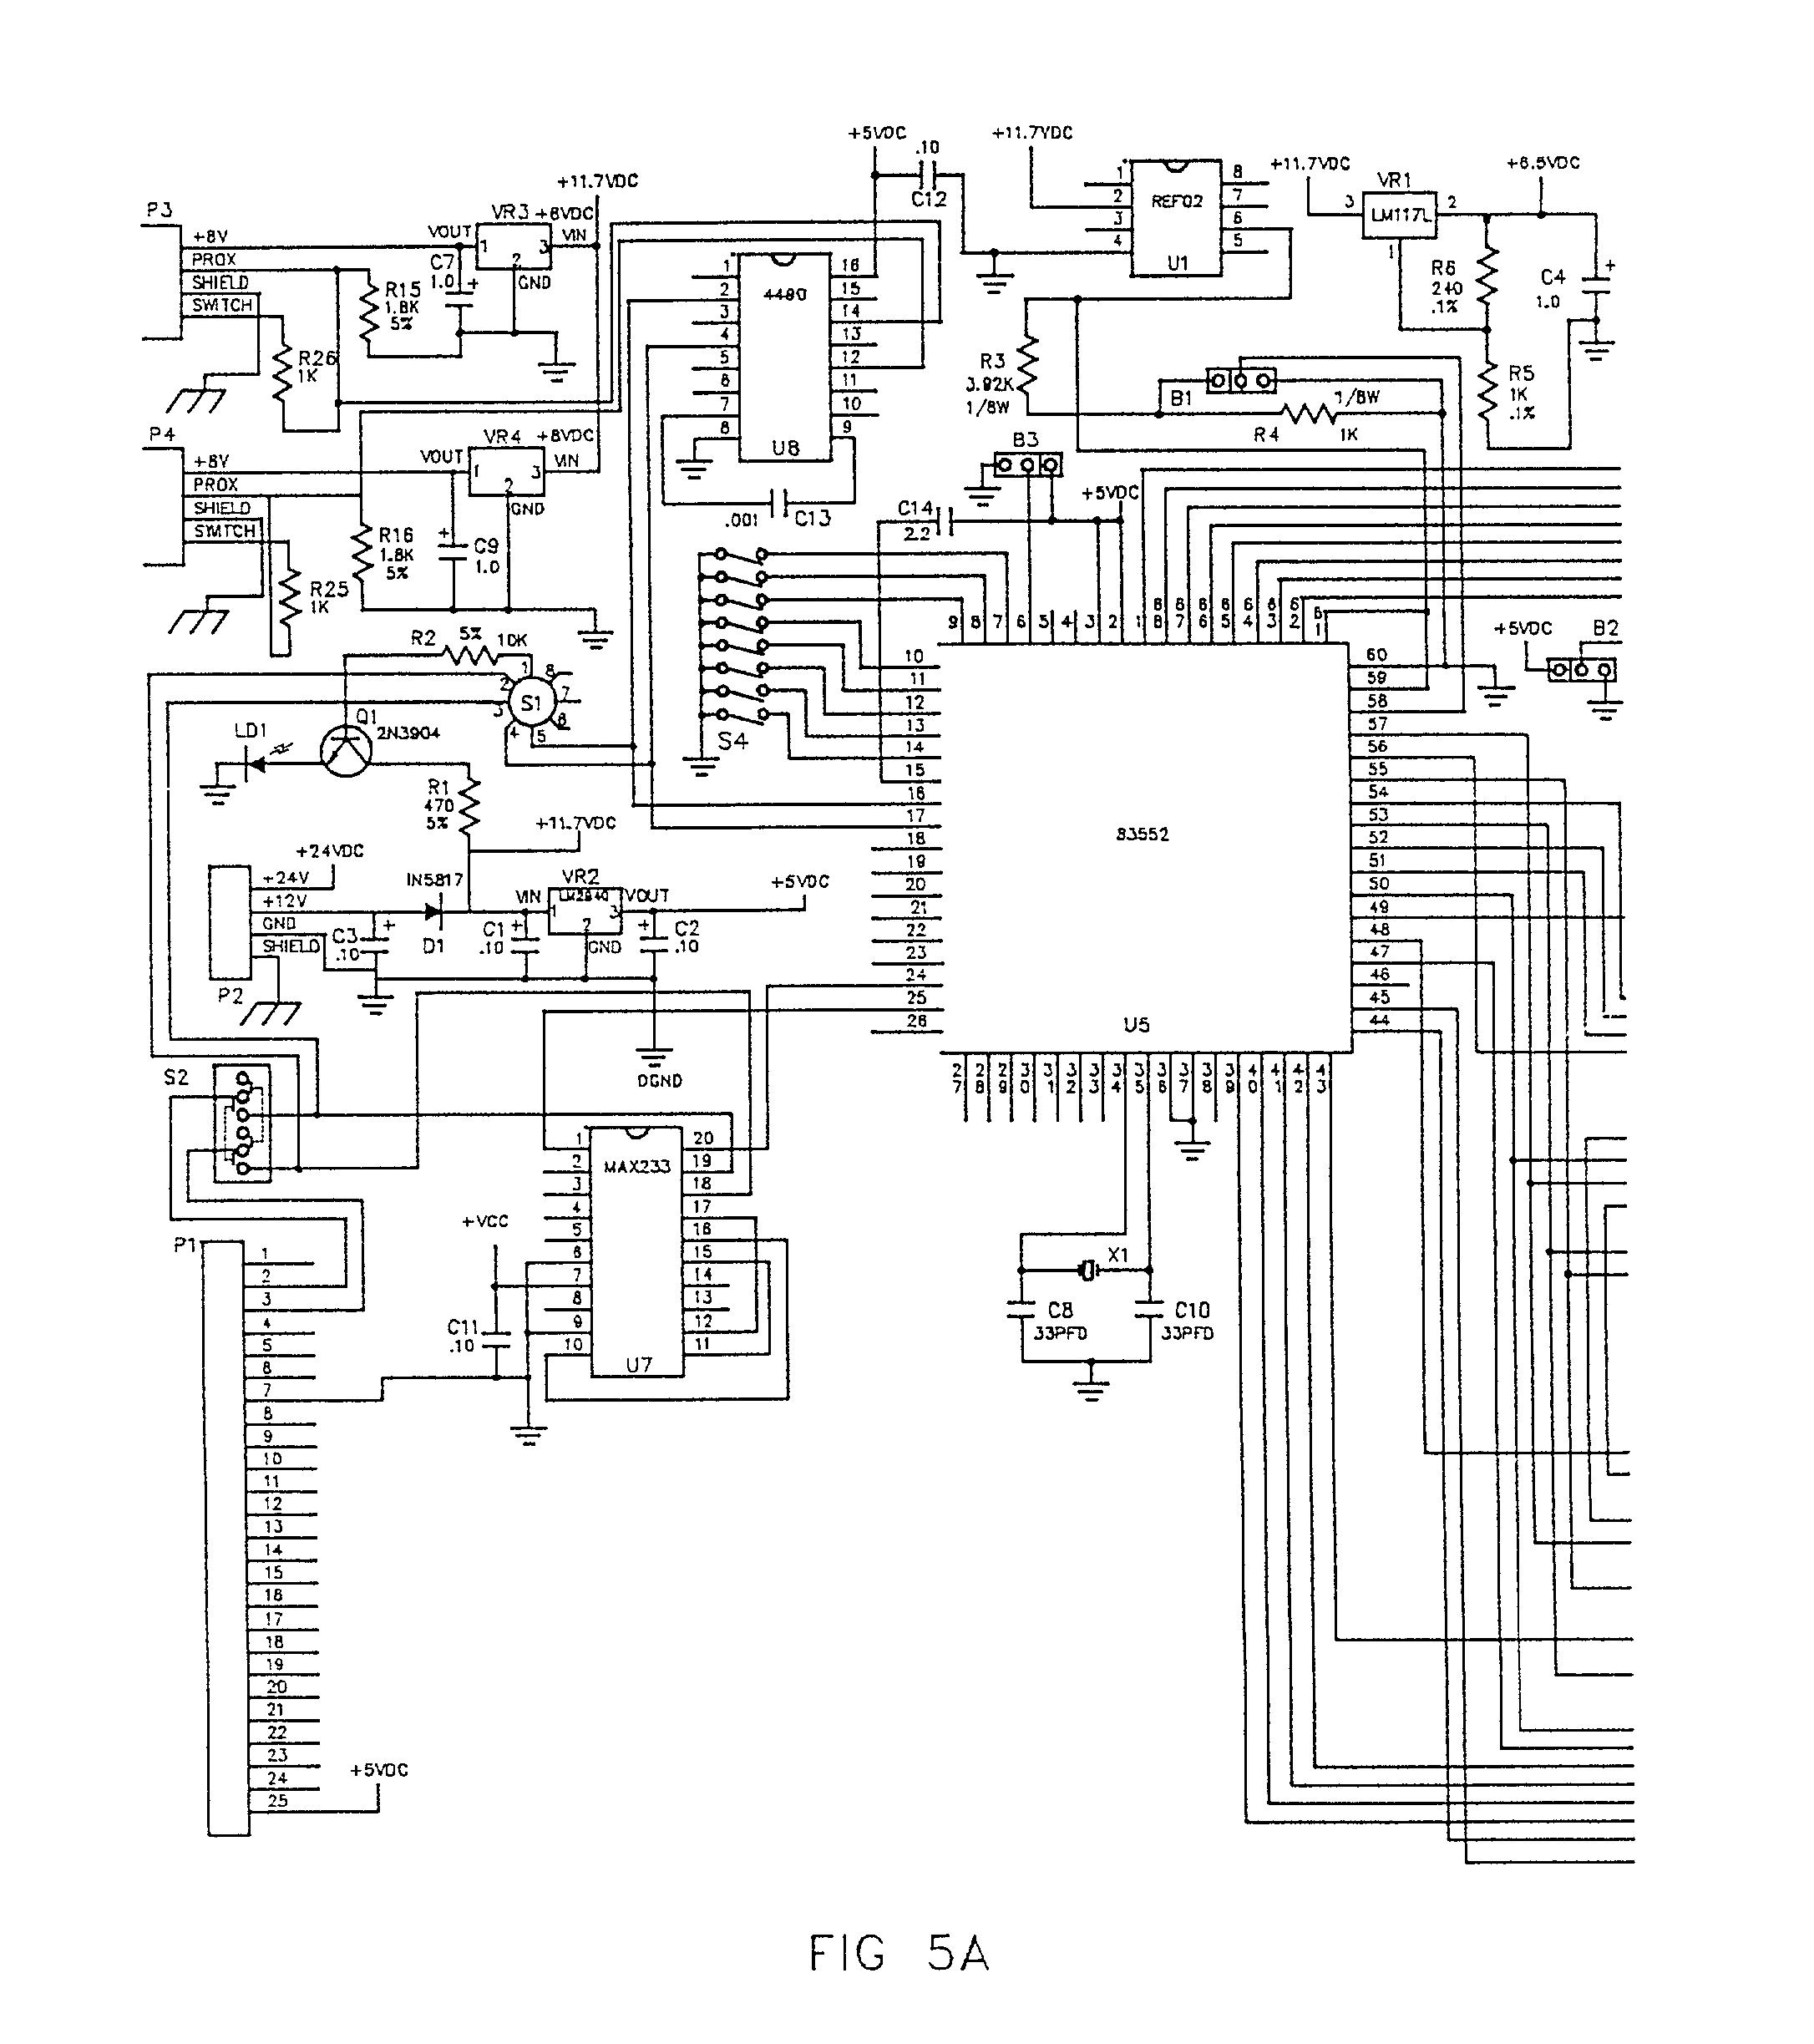 clifford concept alarm wiring diagram images concept  rcd 300 wiring diagram diagrams database